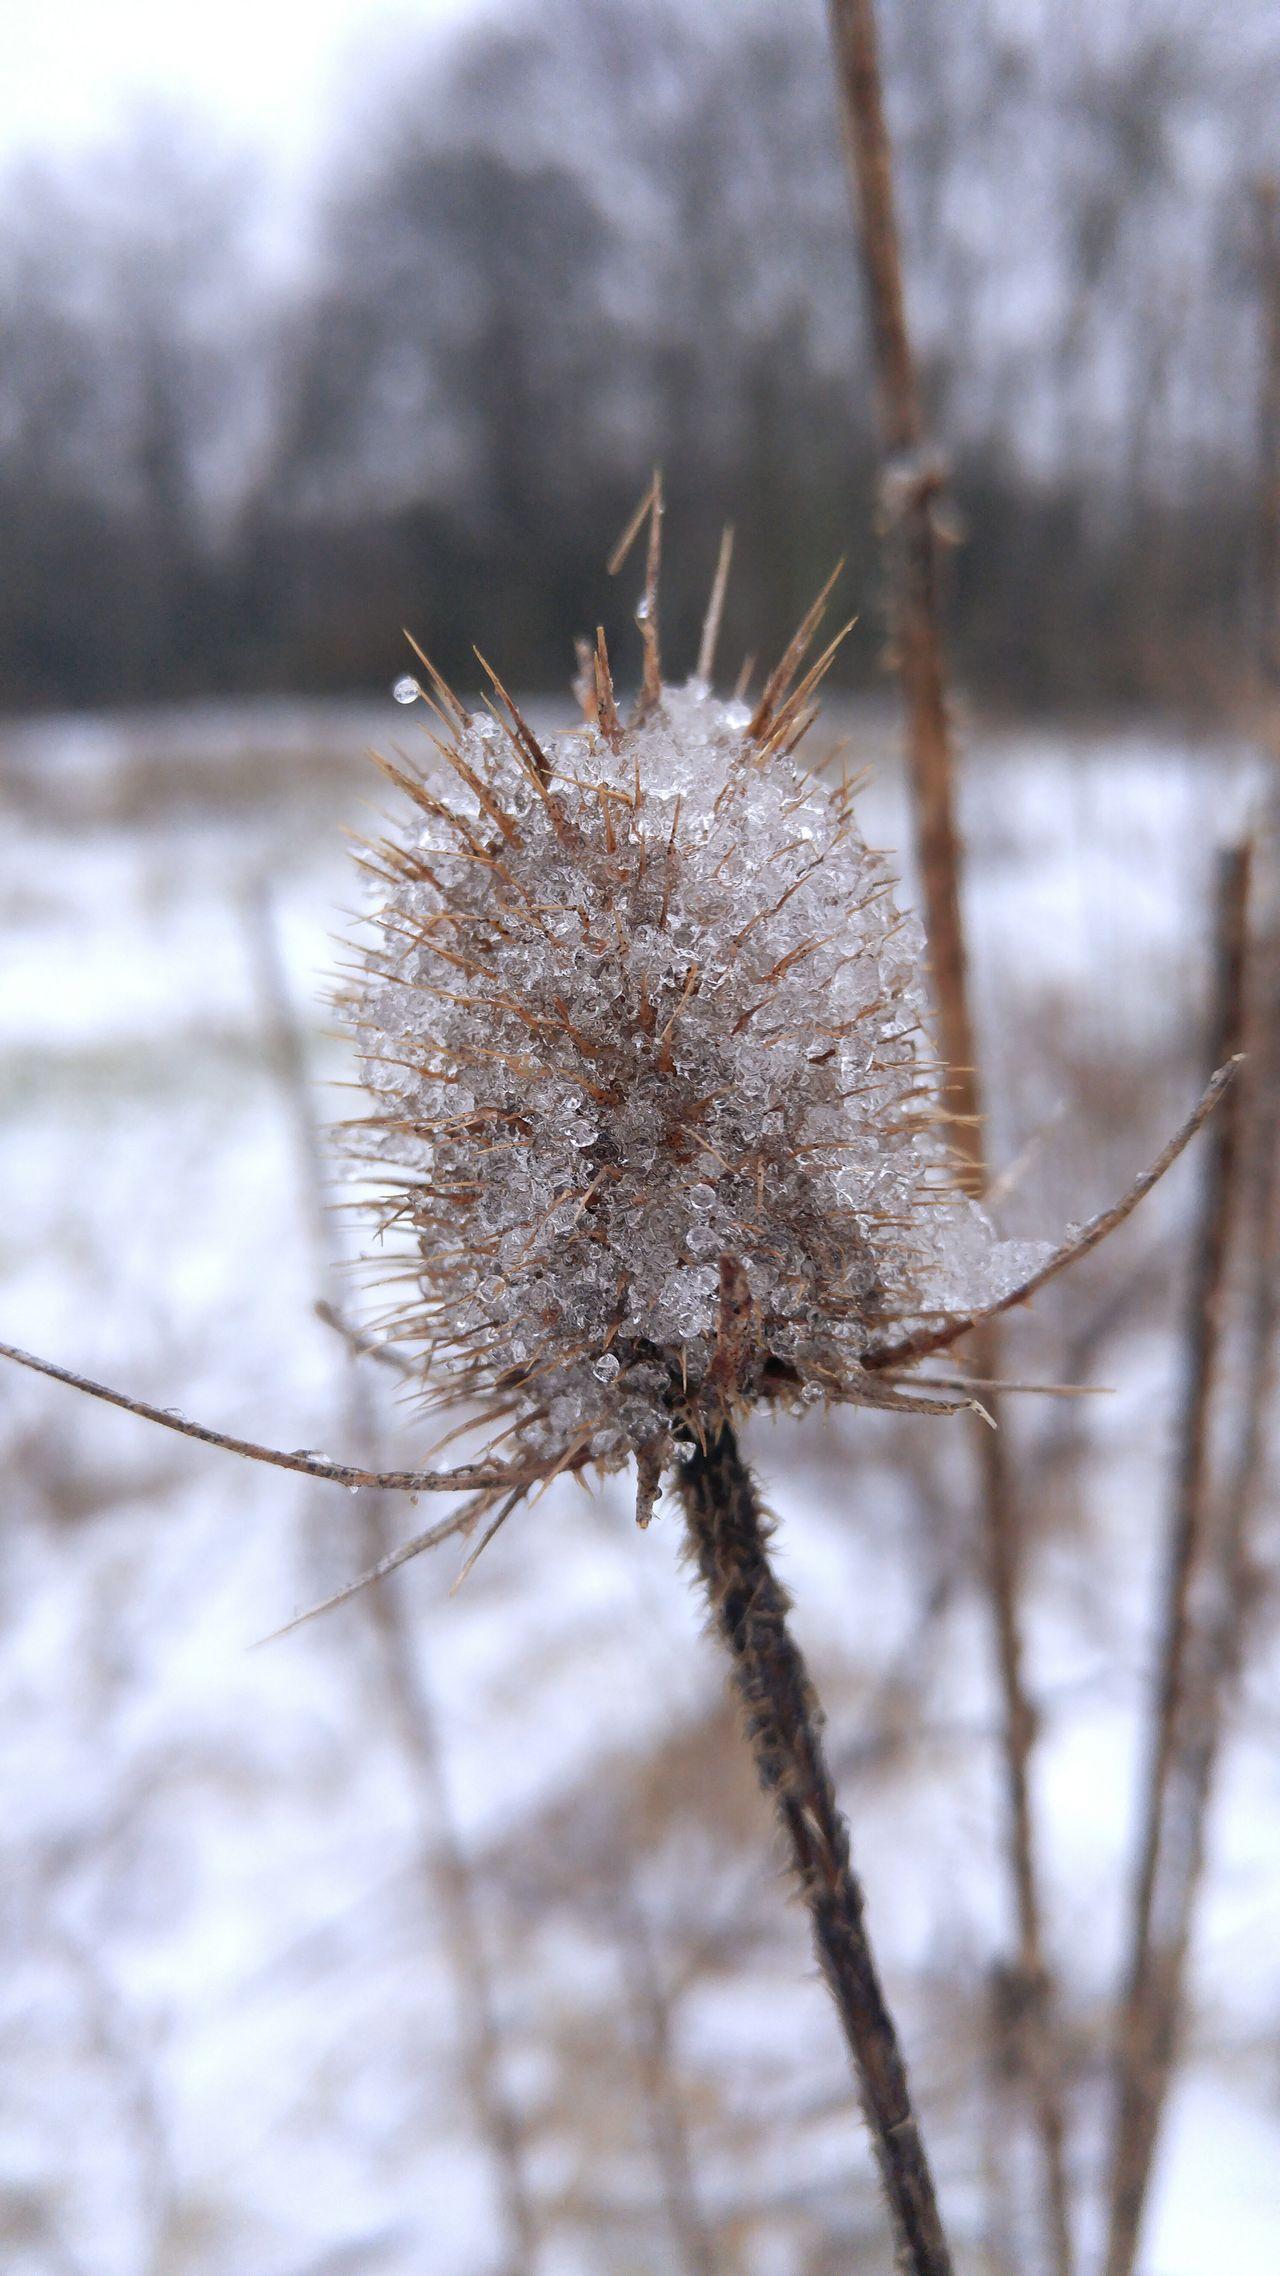 Thistle Nature Outdoors Macro Beauty Macro Photography Snow Ice Fwjphotos Winter LG G4